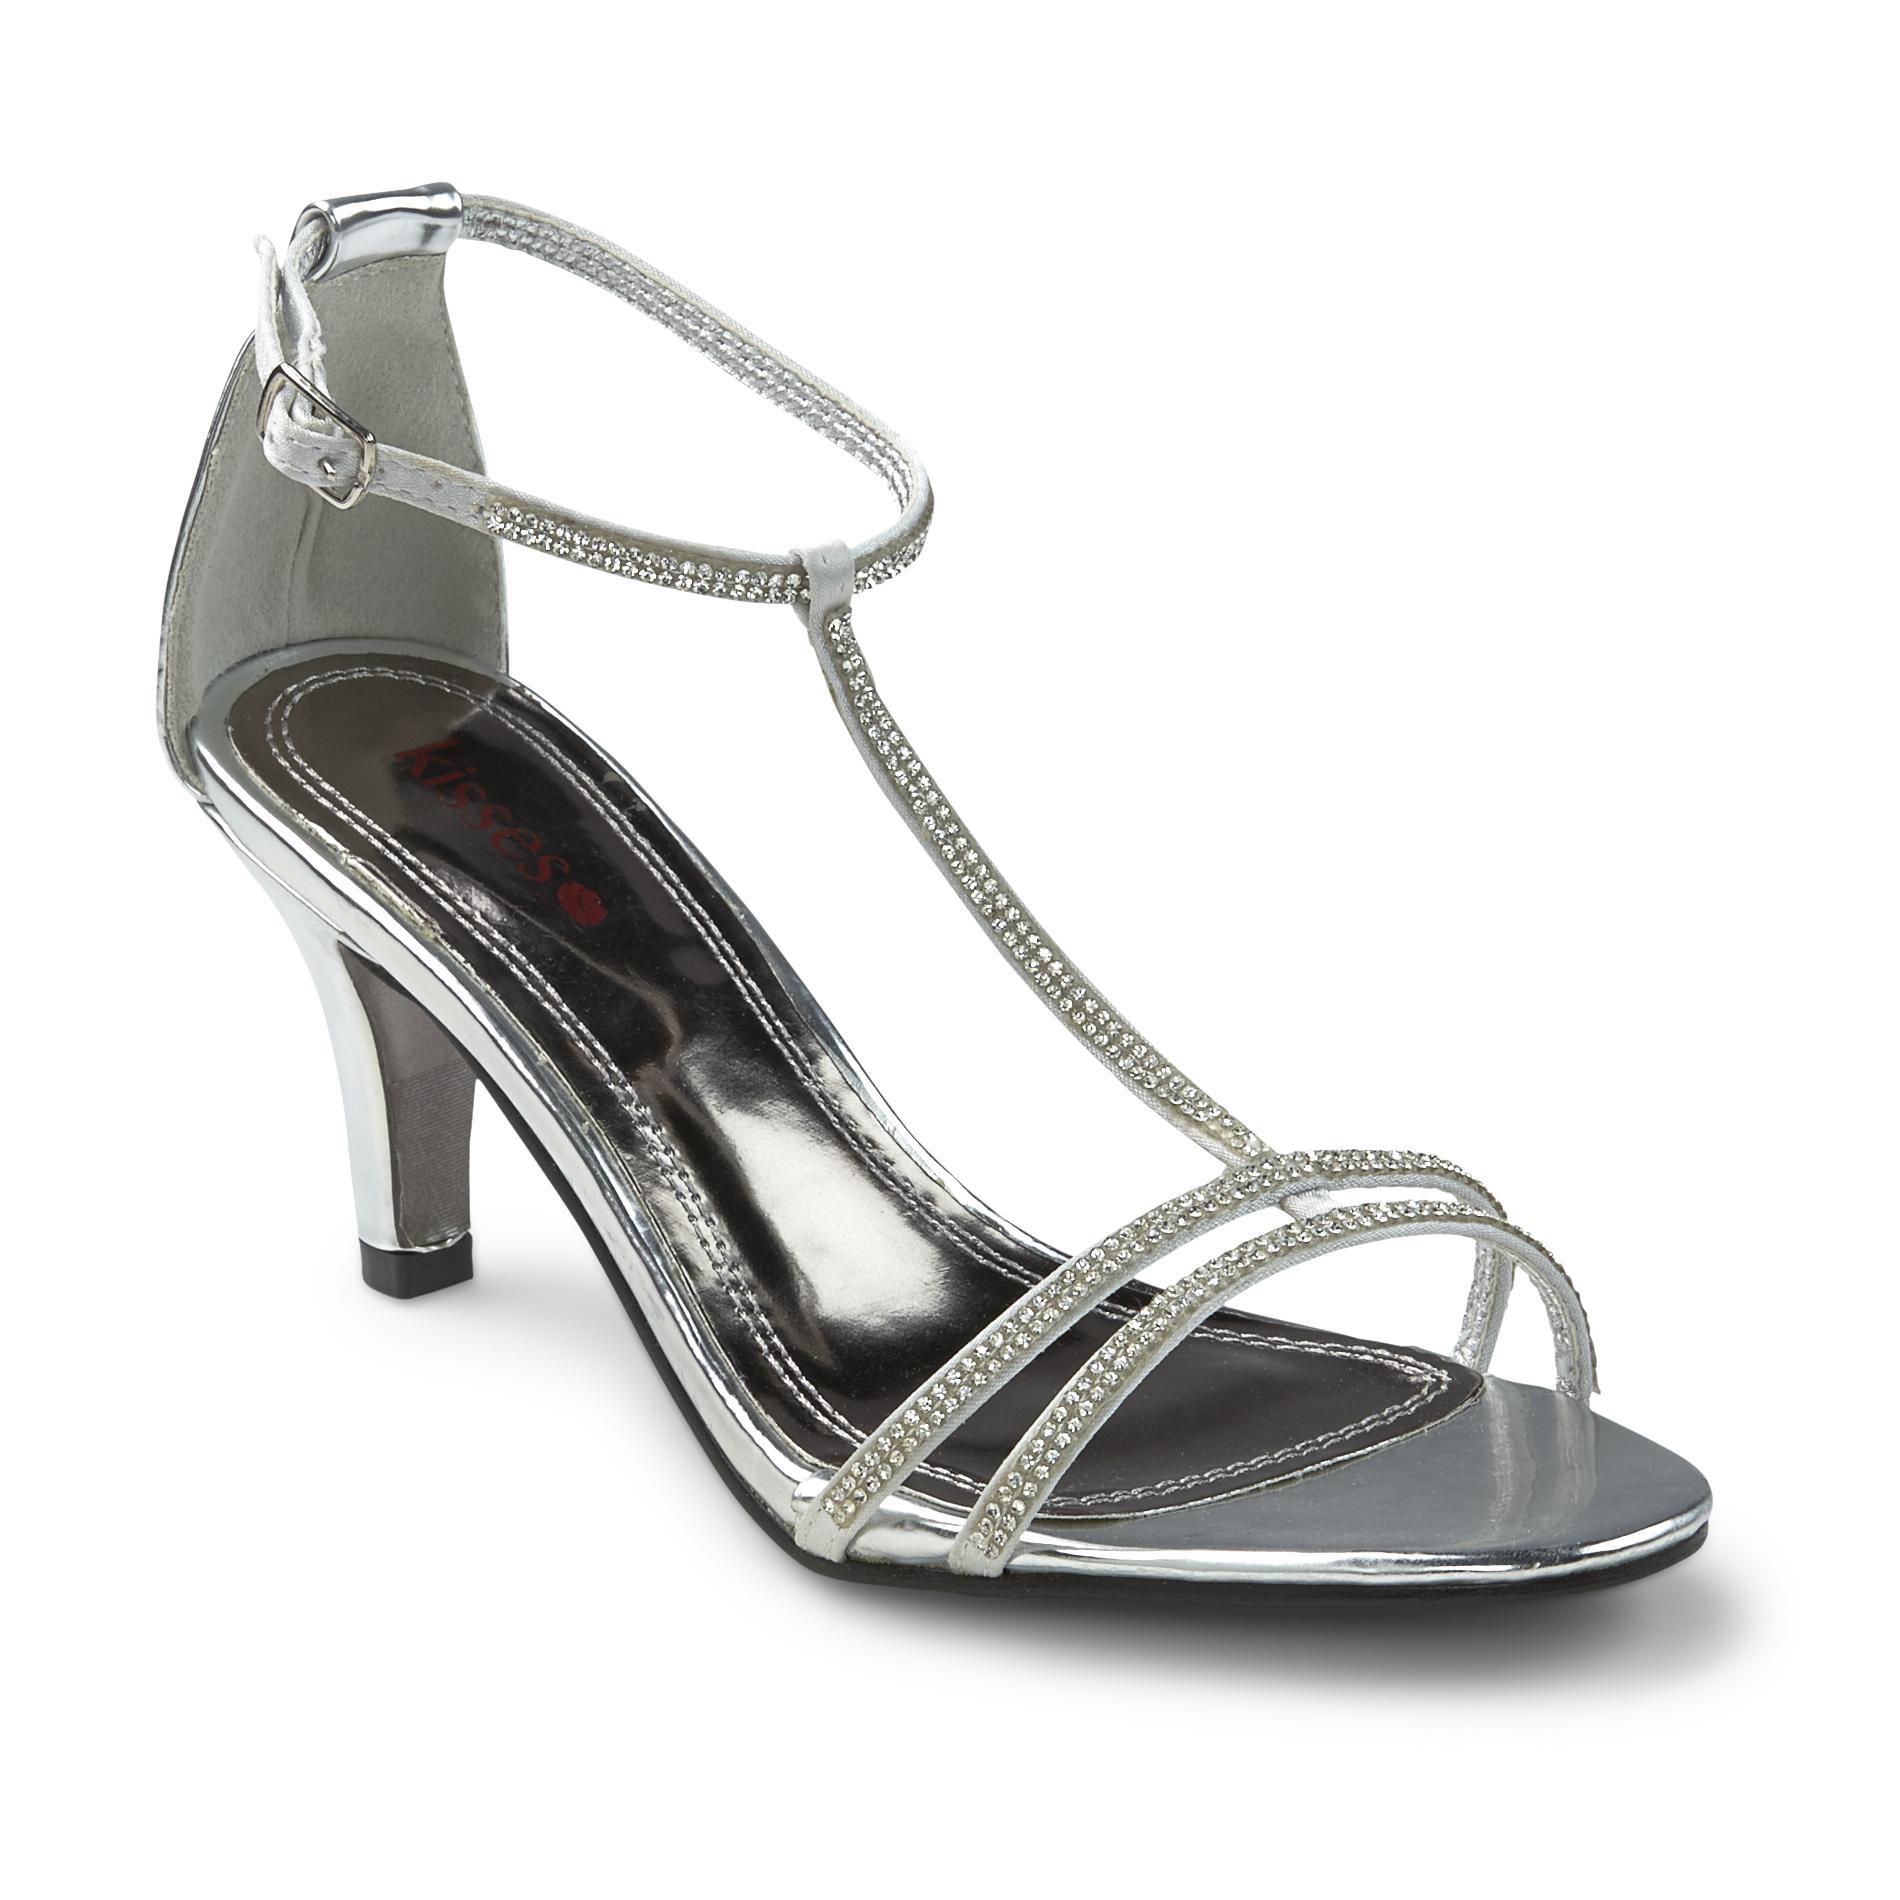 Women's Too Eventful Silver High Heel Dress Shoe